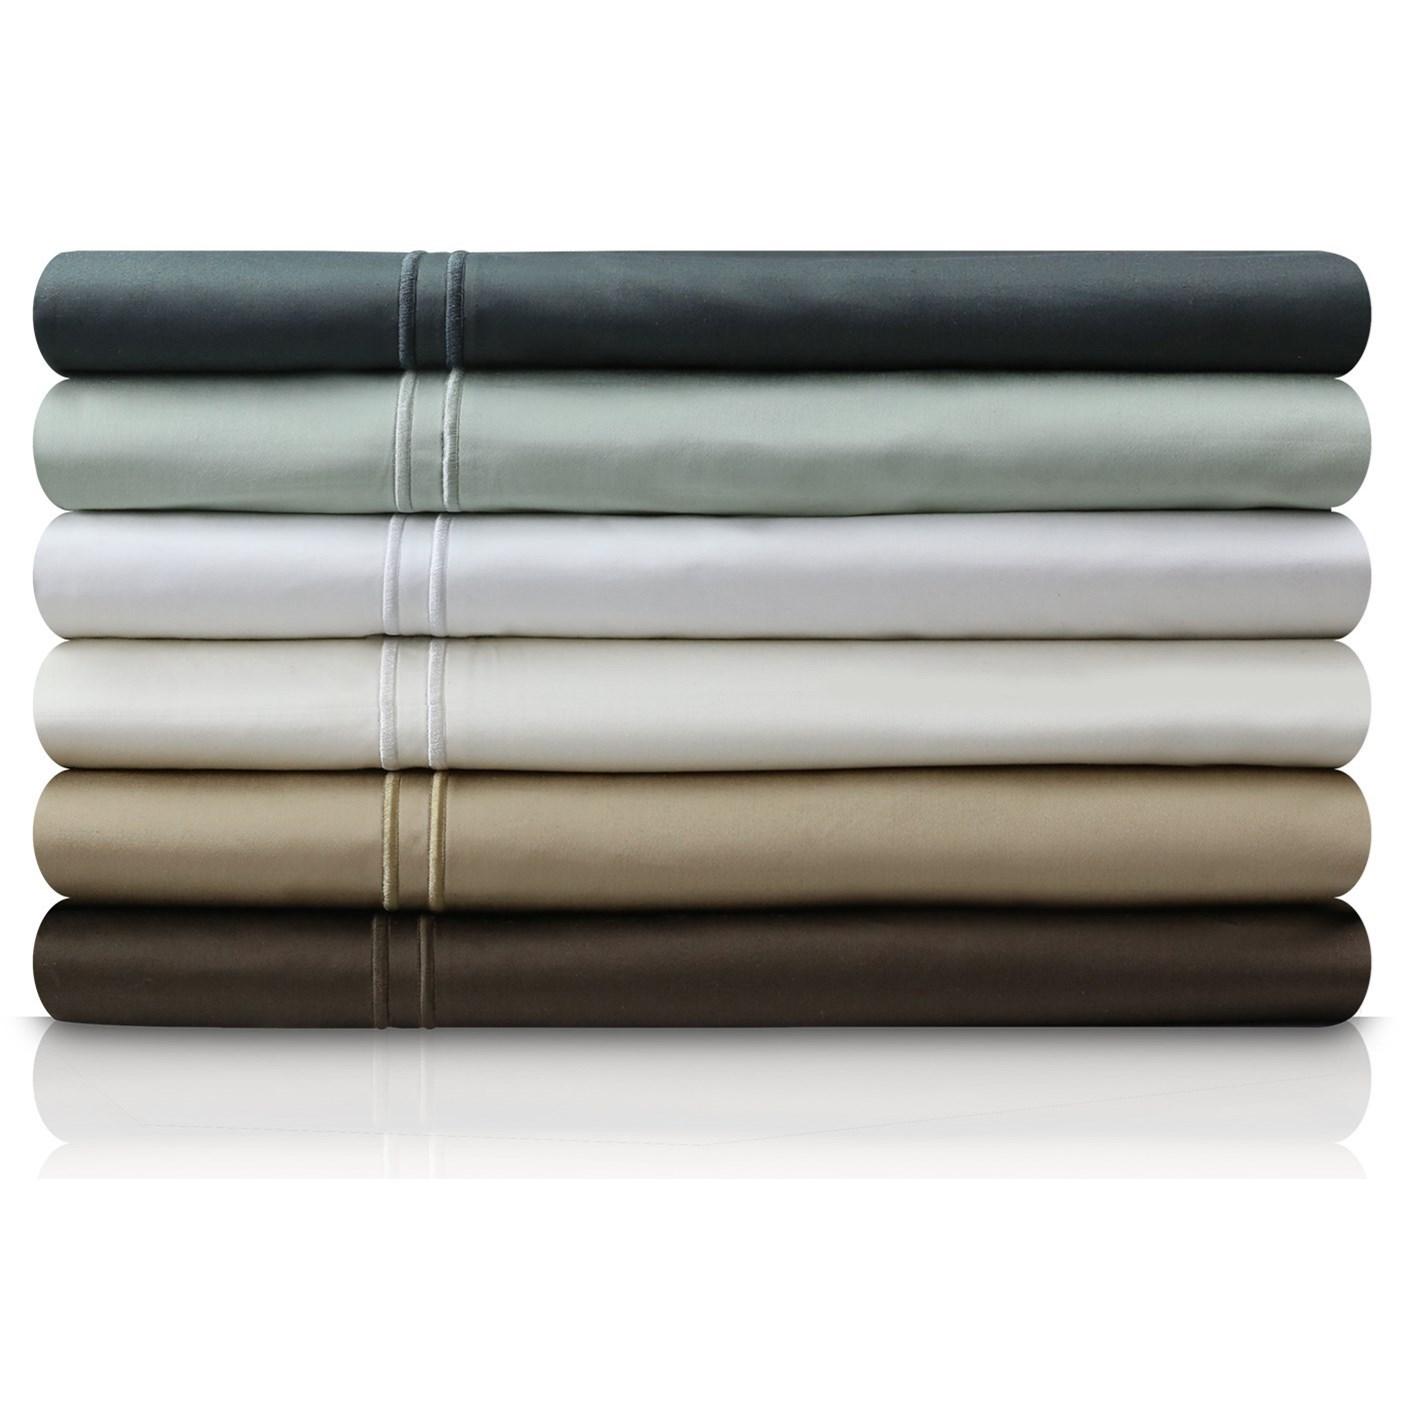 Malouf Egyptian Cotton Split King 600 TC Egyptian Cotton Sheet Set - Item Number: MA06SKSLSS